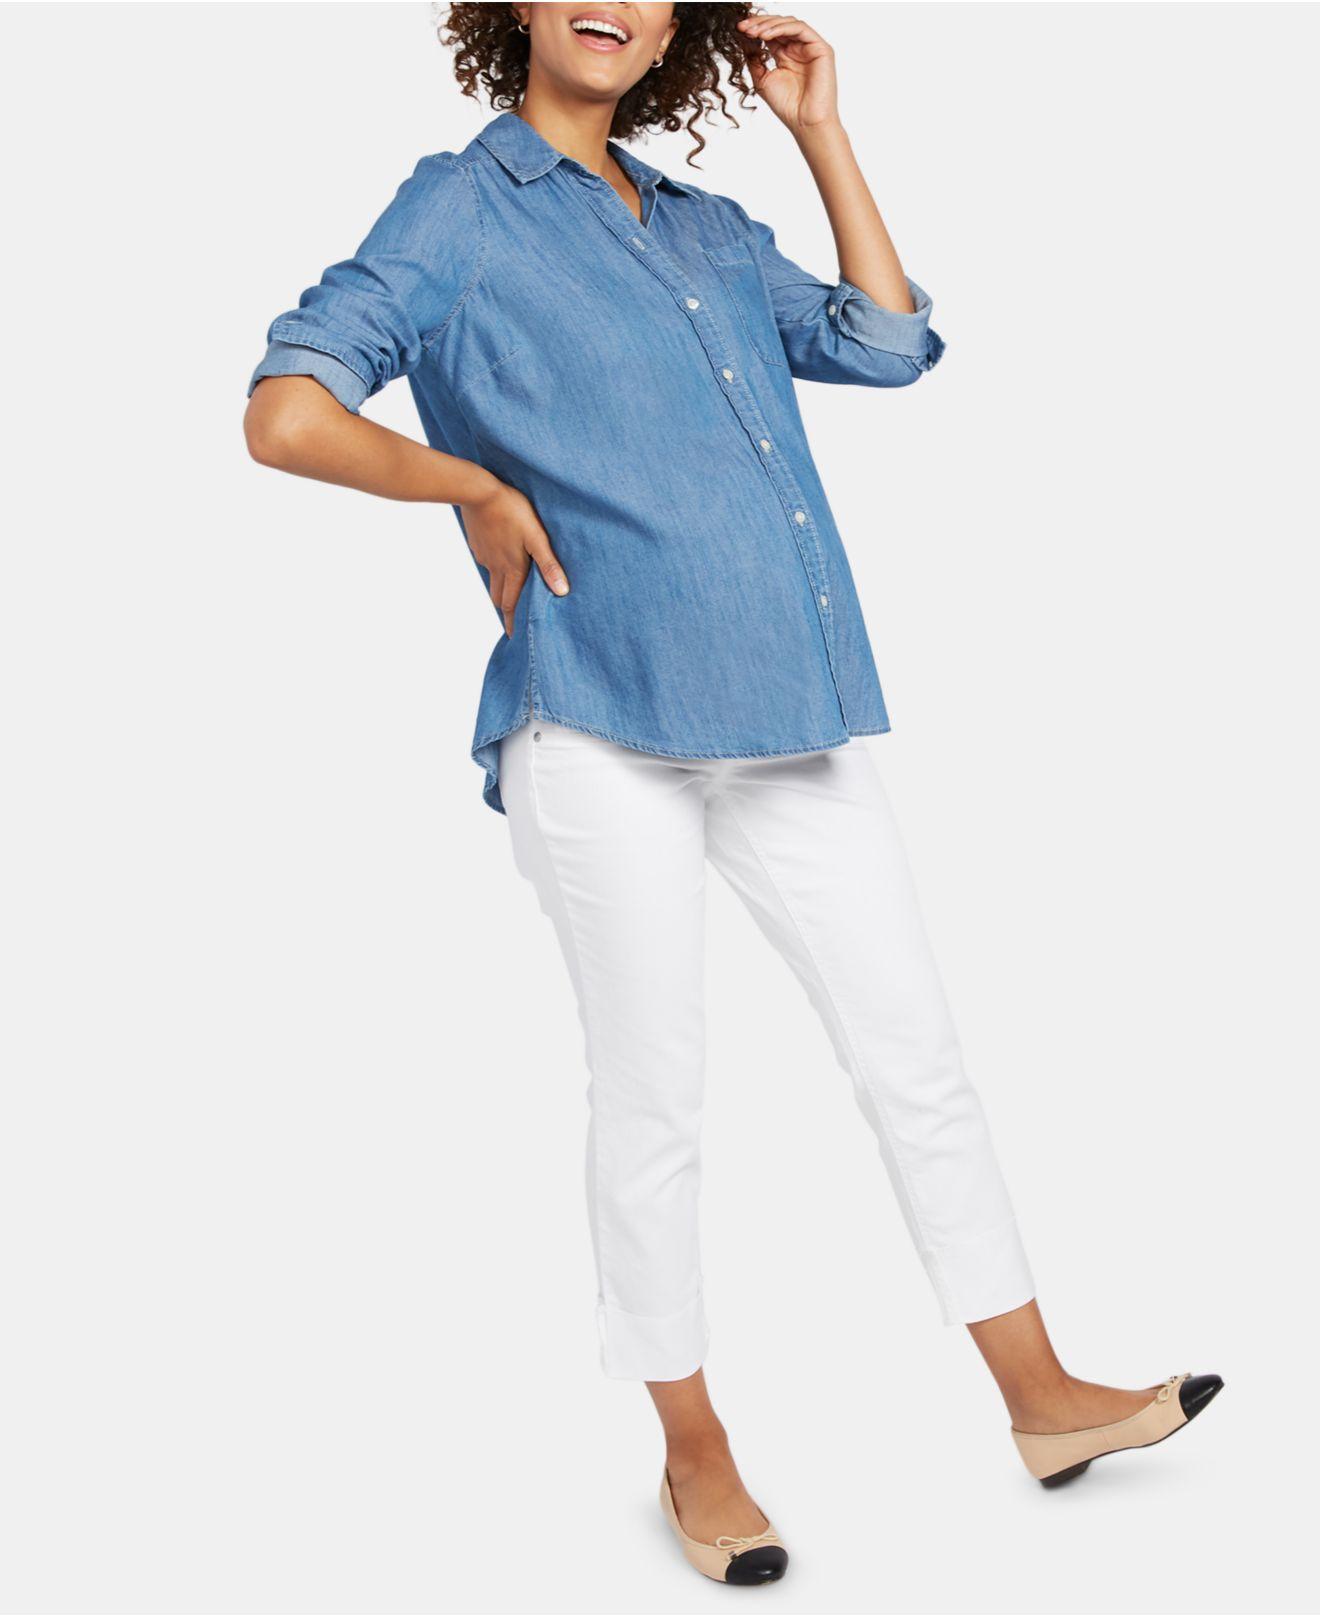 430c77fc1de72 Lyst - Indigo Blue Motherhood Maternity Skinny Jeans in White